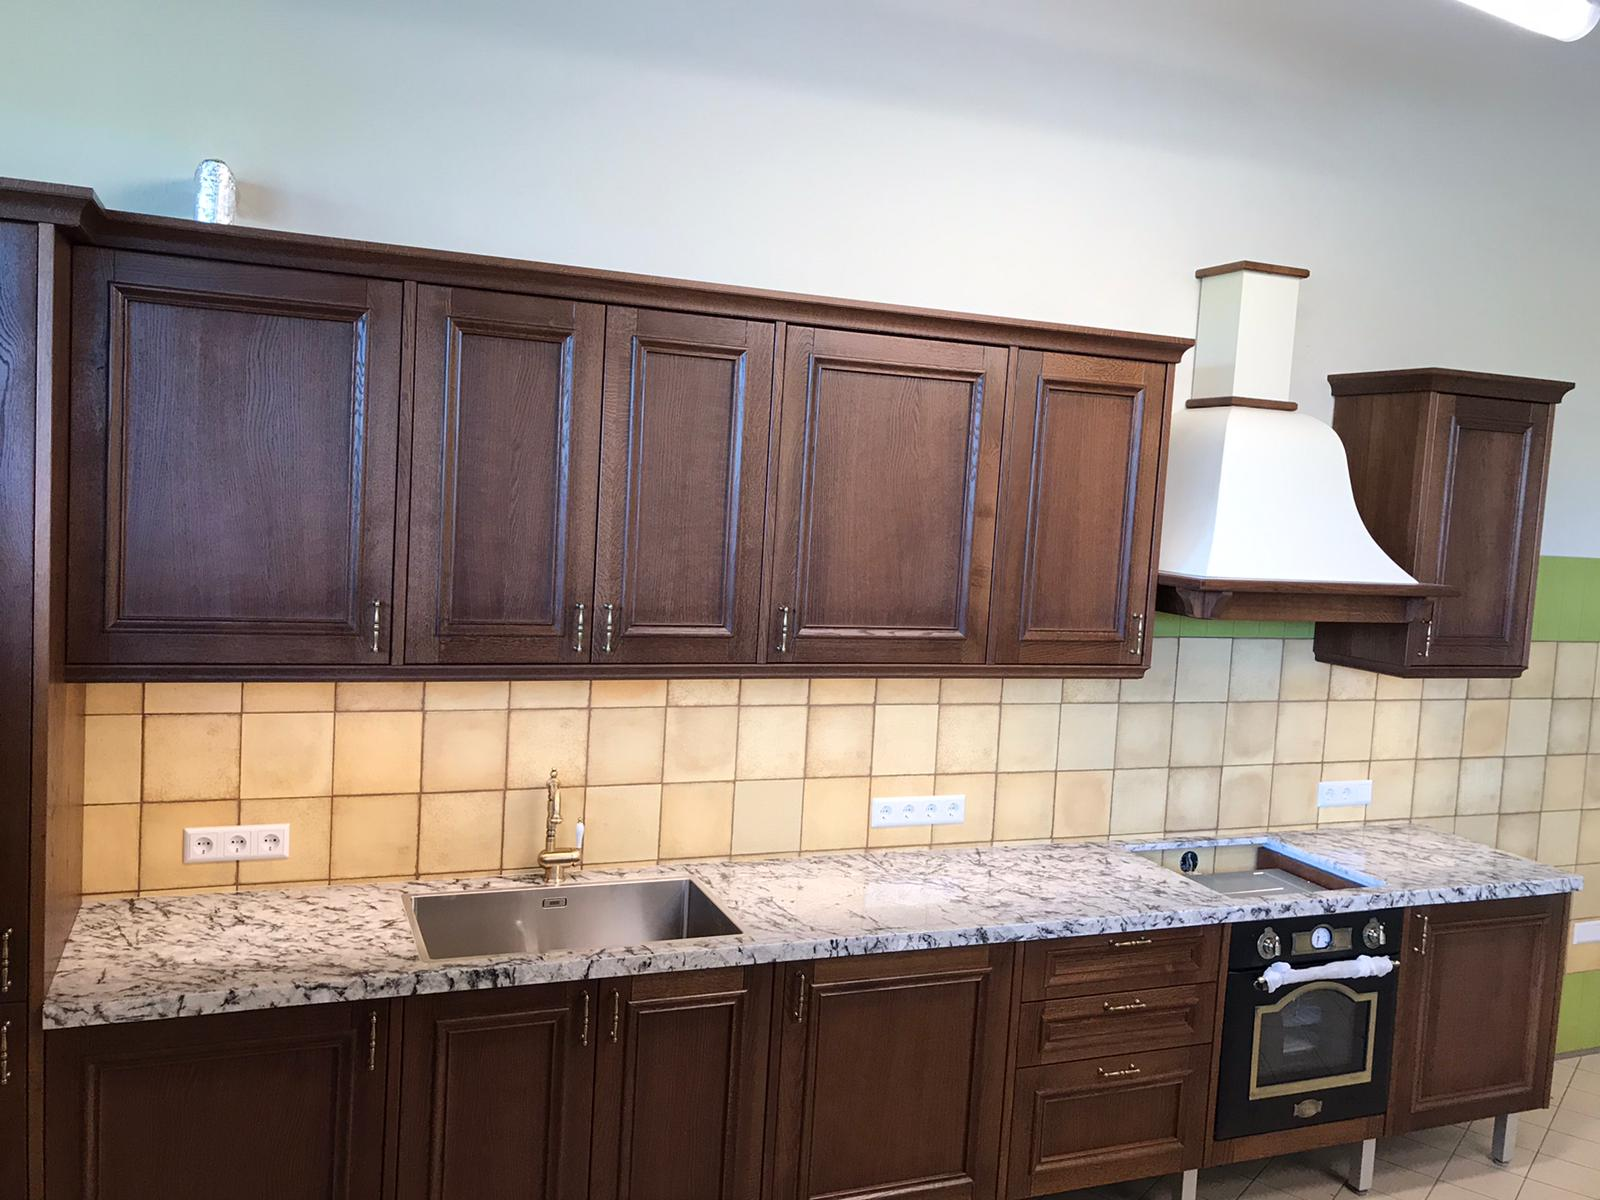 cik maksā akmens virtuves virsma